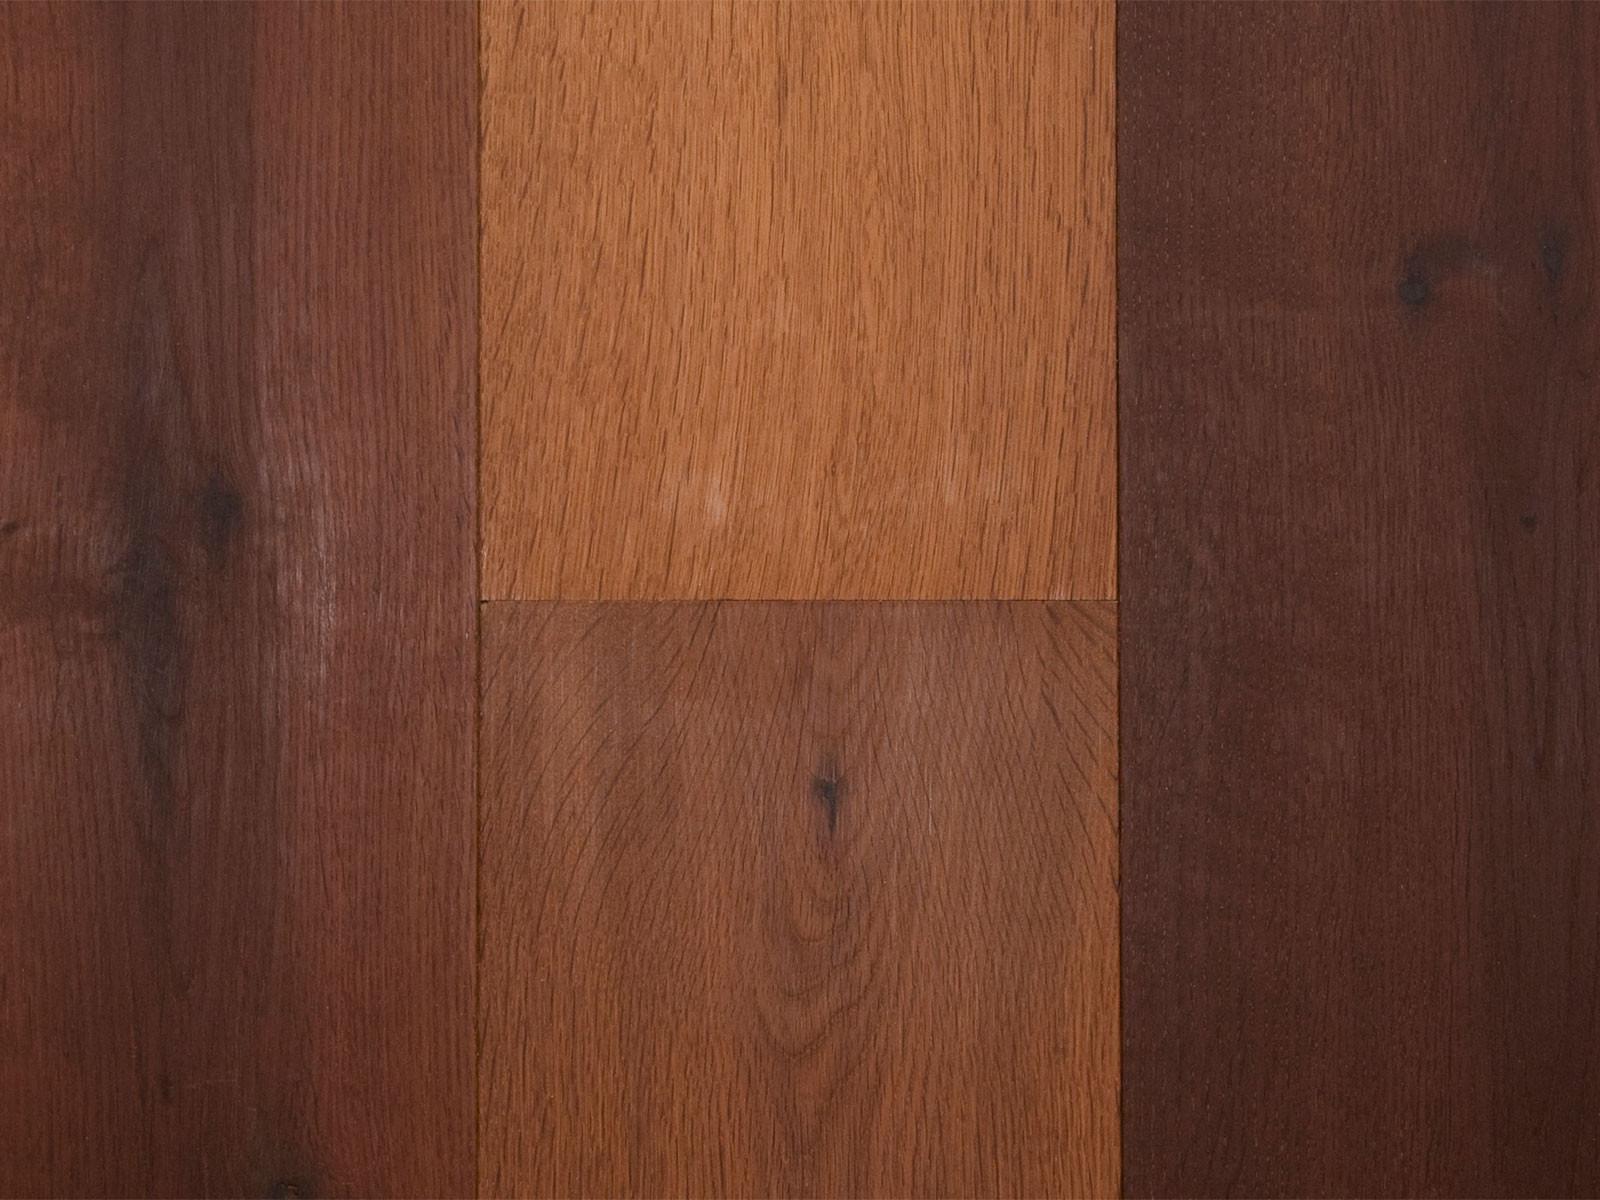 european oak hardwood floors of duchateau hardwood flooring houston tx discount engineered wood intended for savoy european oak